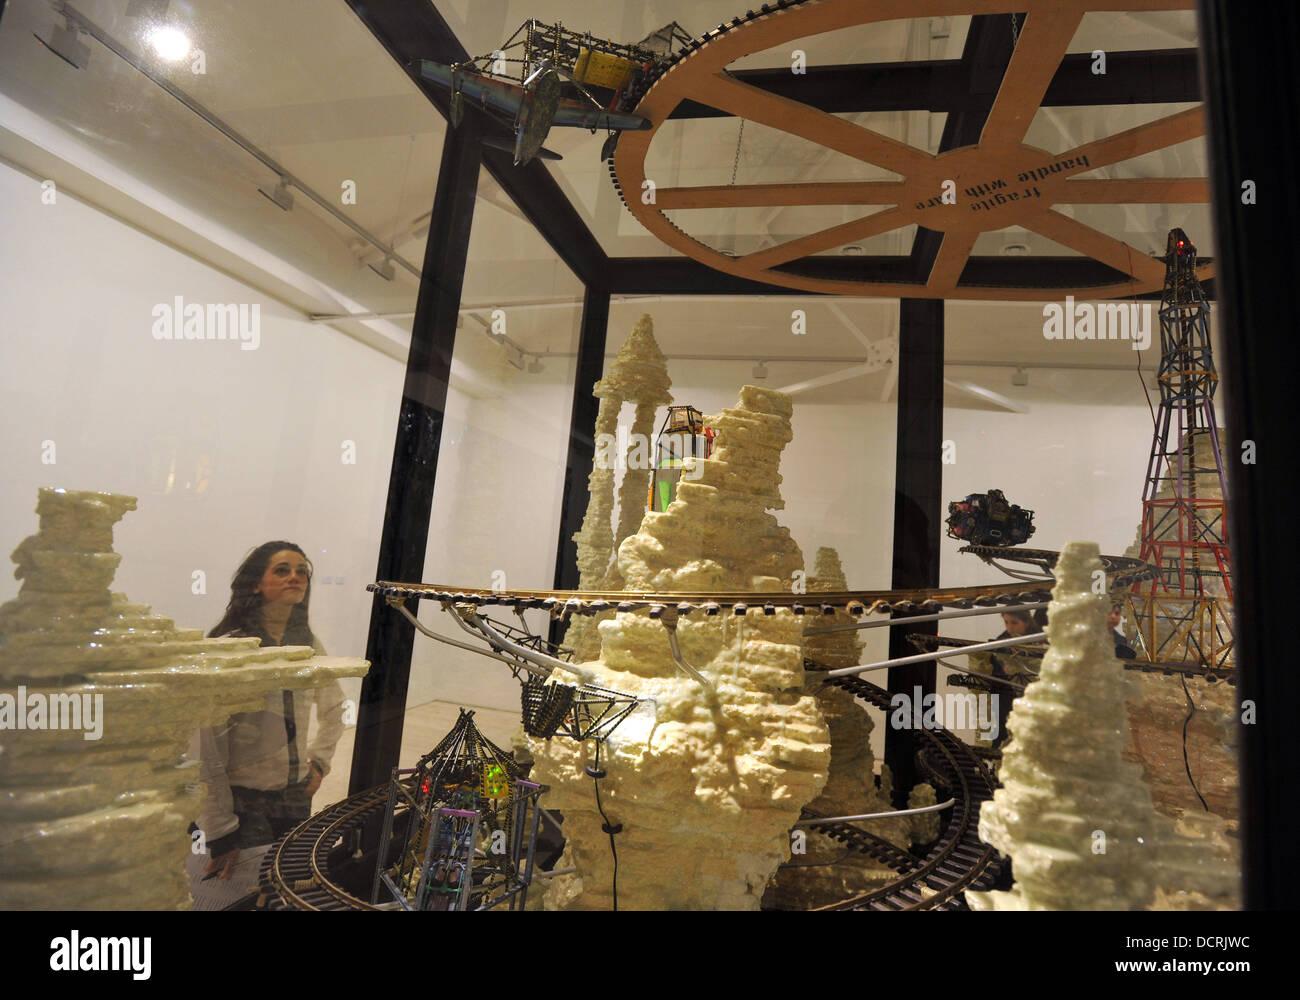 Zhivago Duncan: Pretentious Crap Gesamtkunstwerk: New Art From Germany - exhibition press view held at the Saatchi Stock Photo